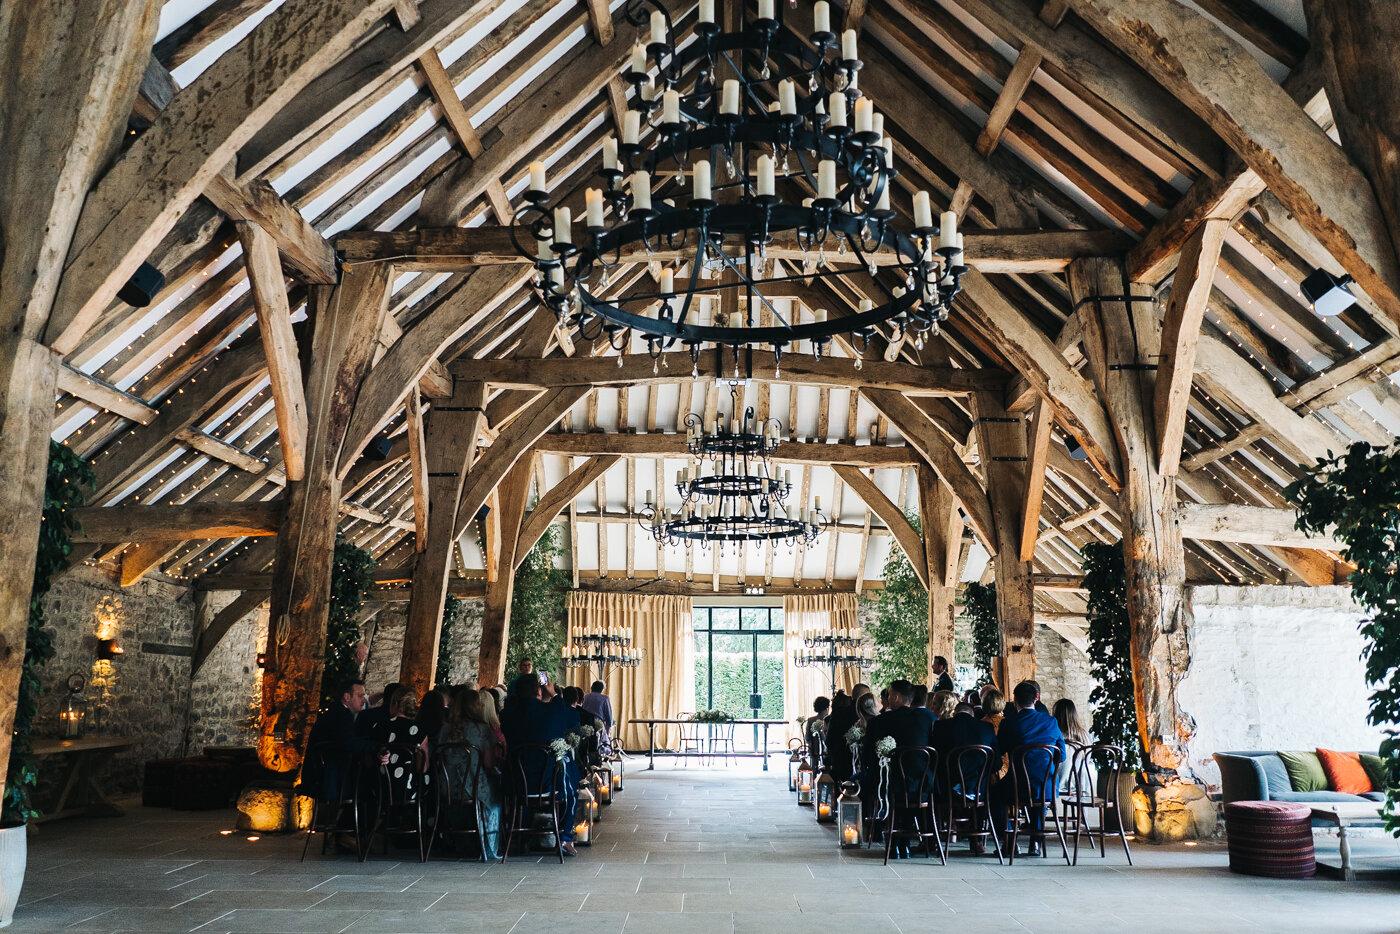 tithe-barn-bolton-abbey-north-yorkshire-cripps-wedding-photographer-creative-0016.jpg